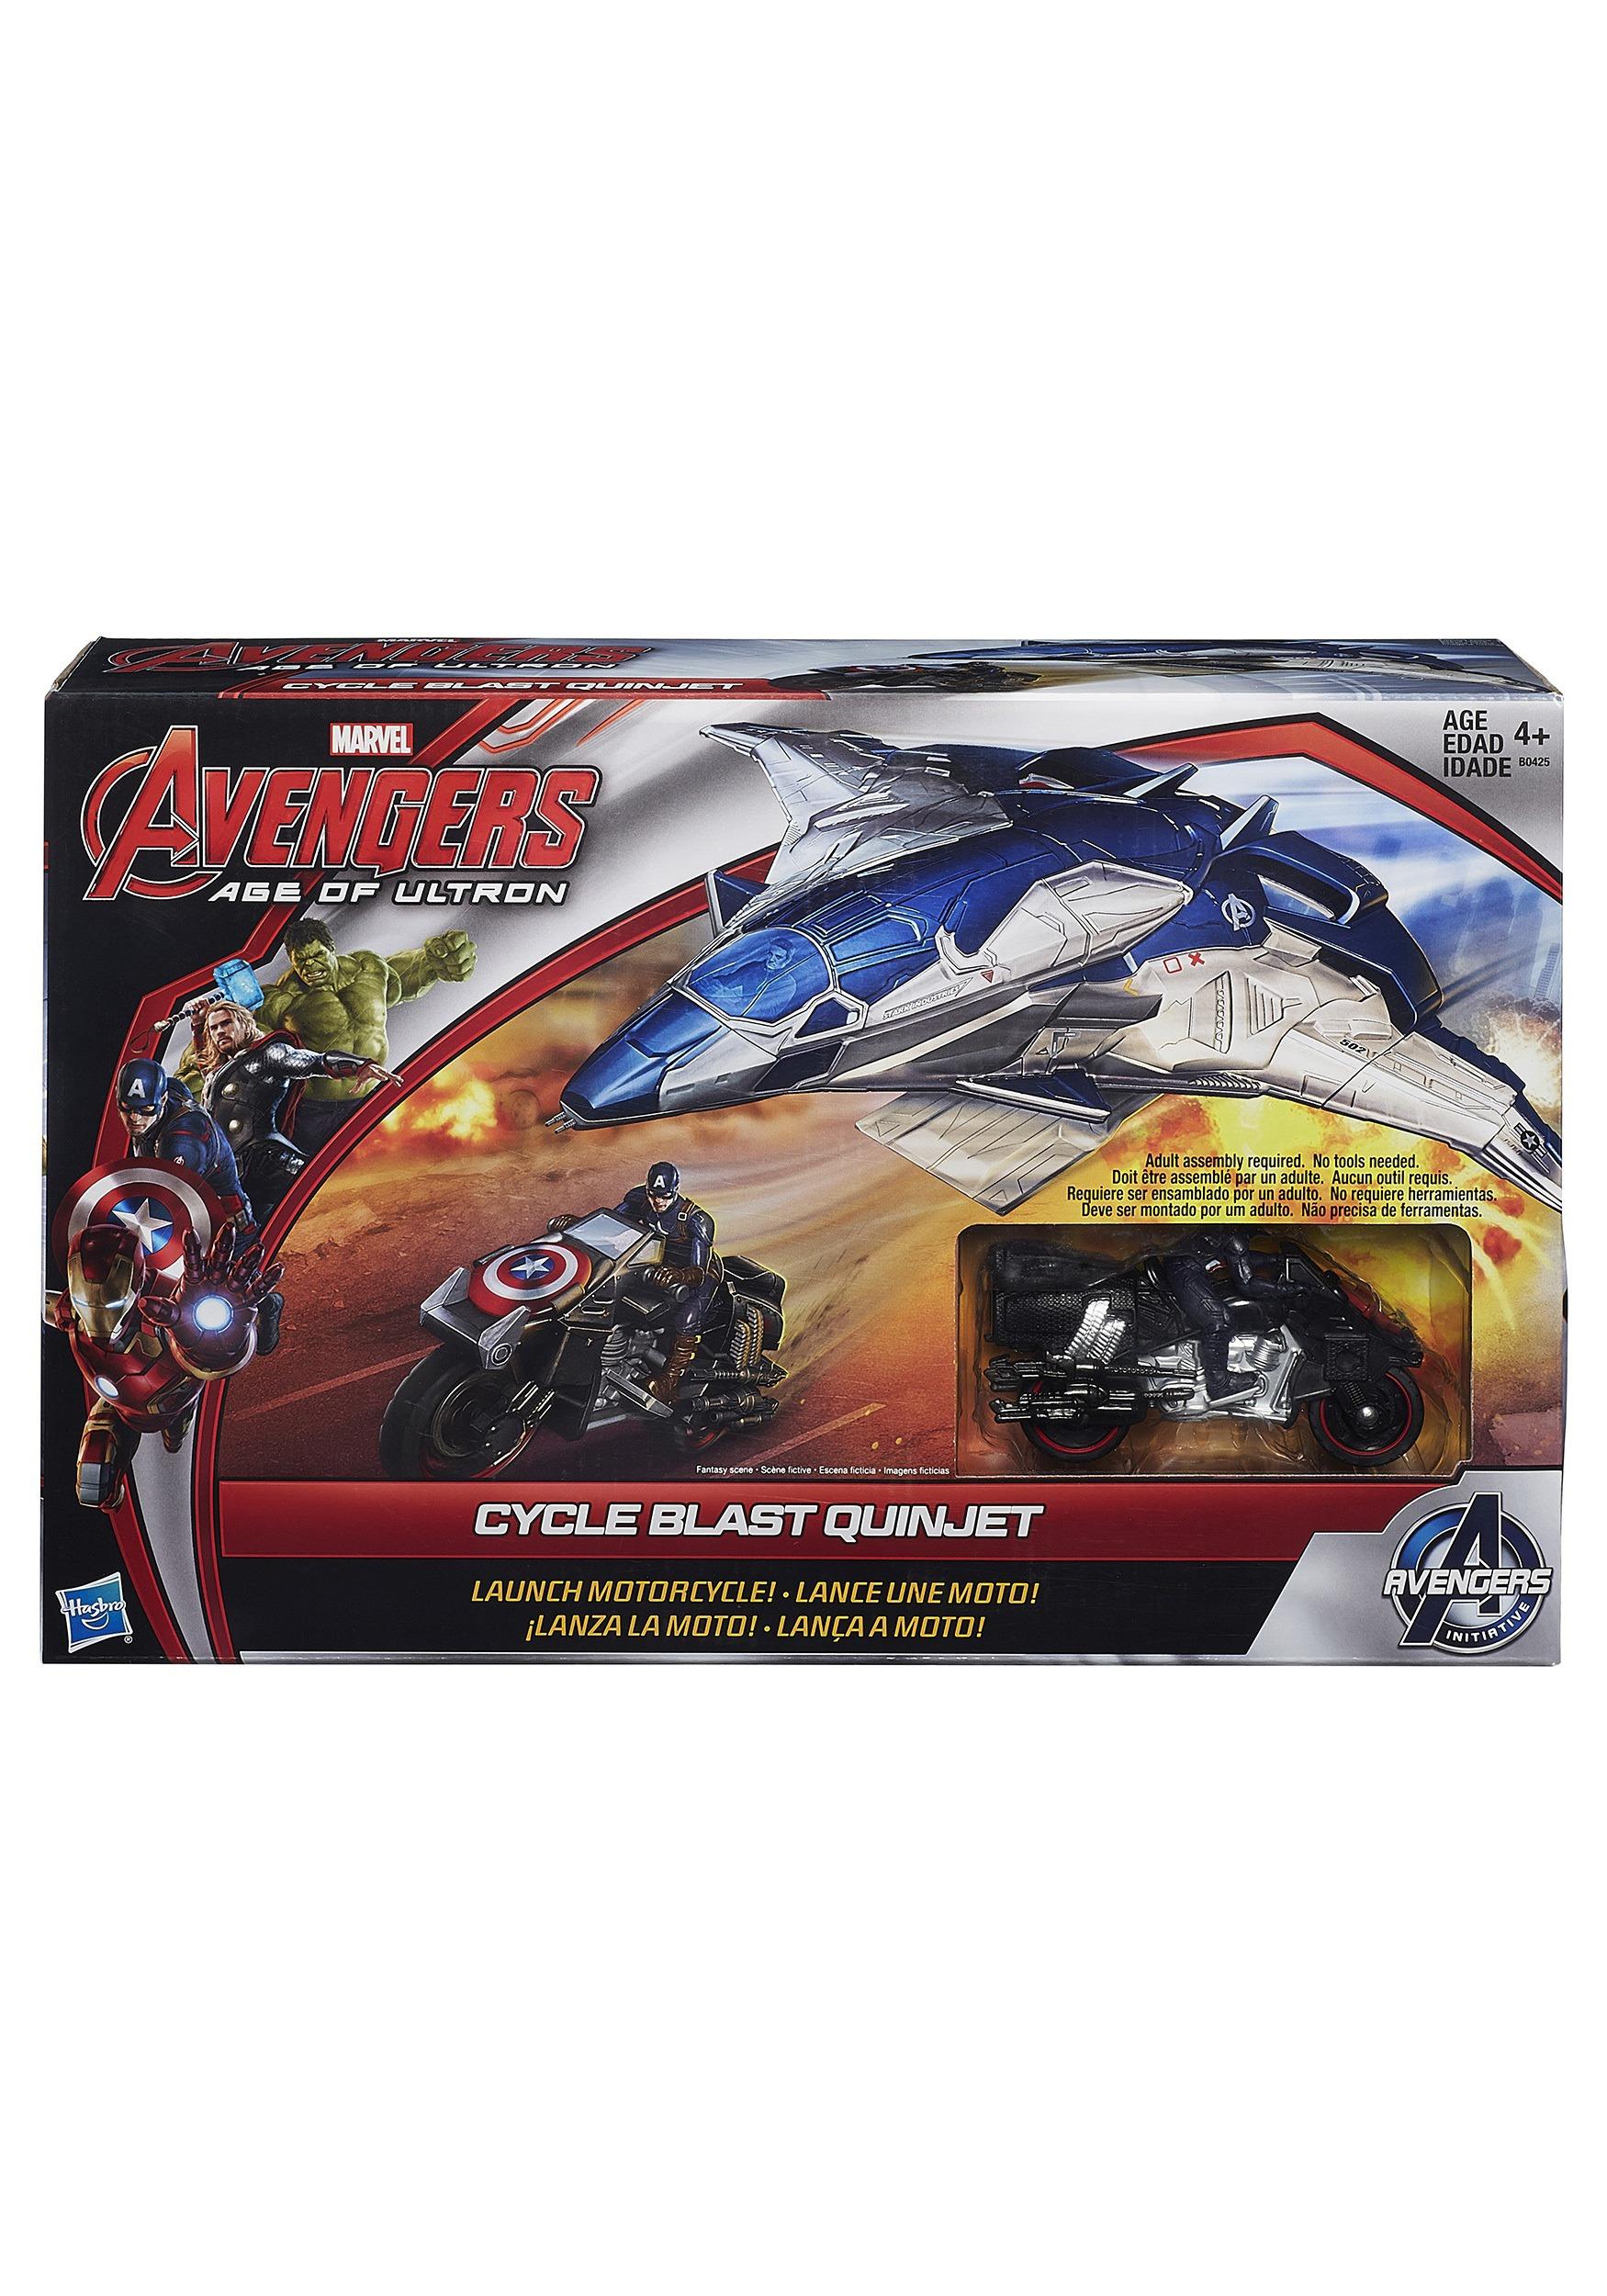 Avengers: Age of Ultron Cycle Blast Quinjet Set EEDHSB0425